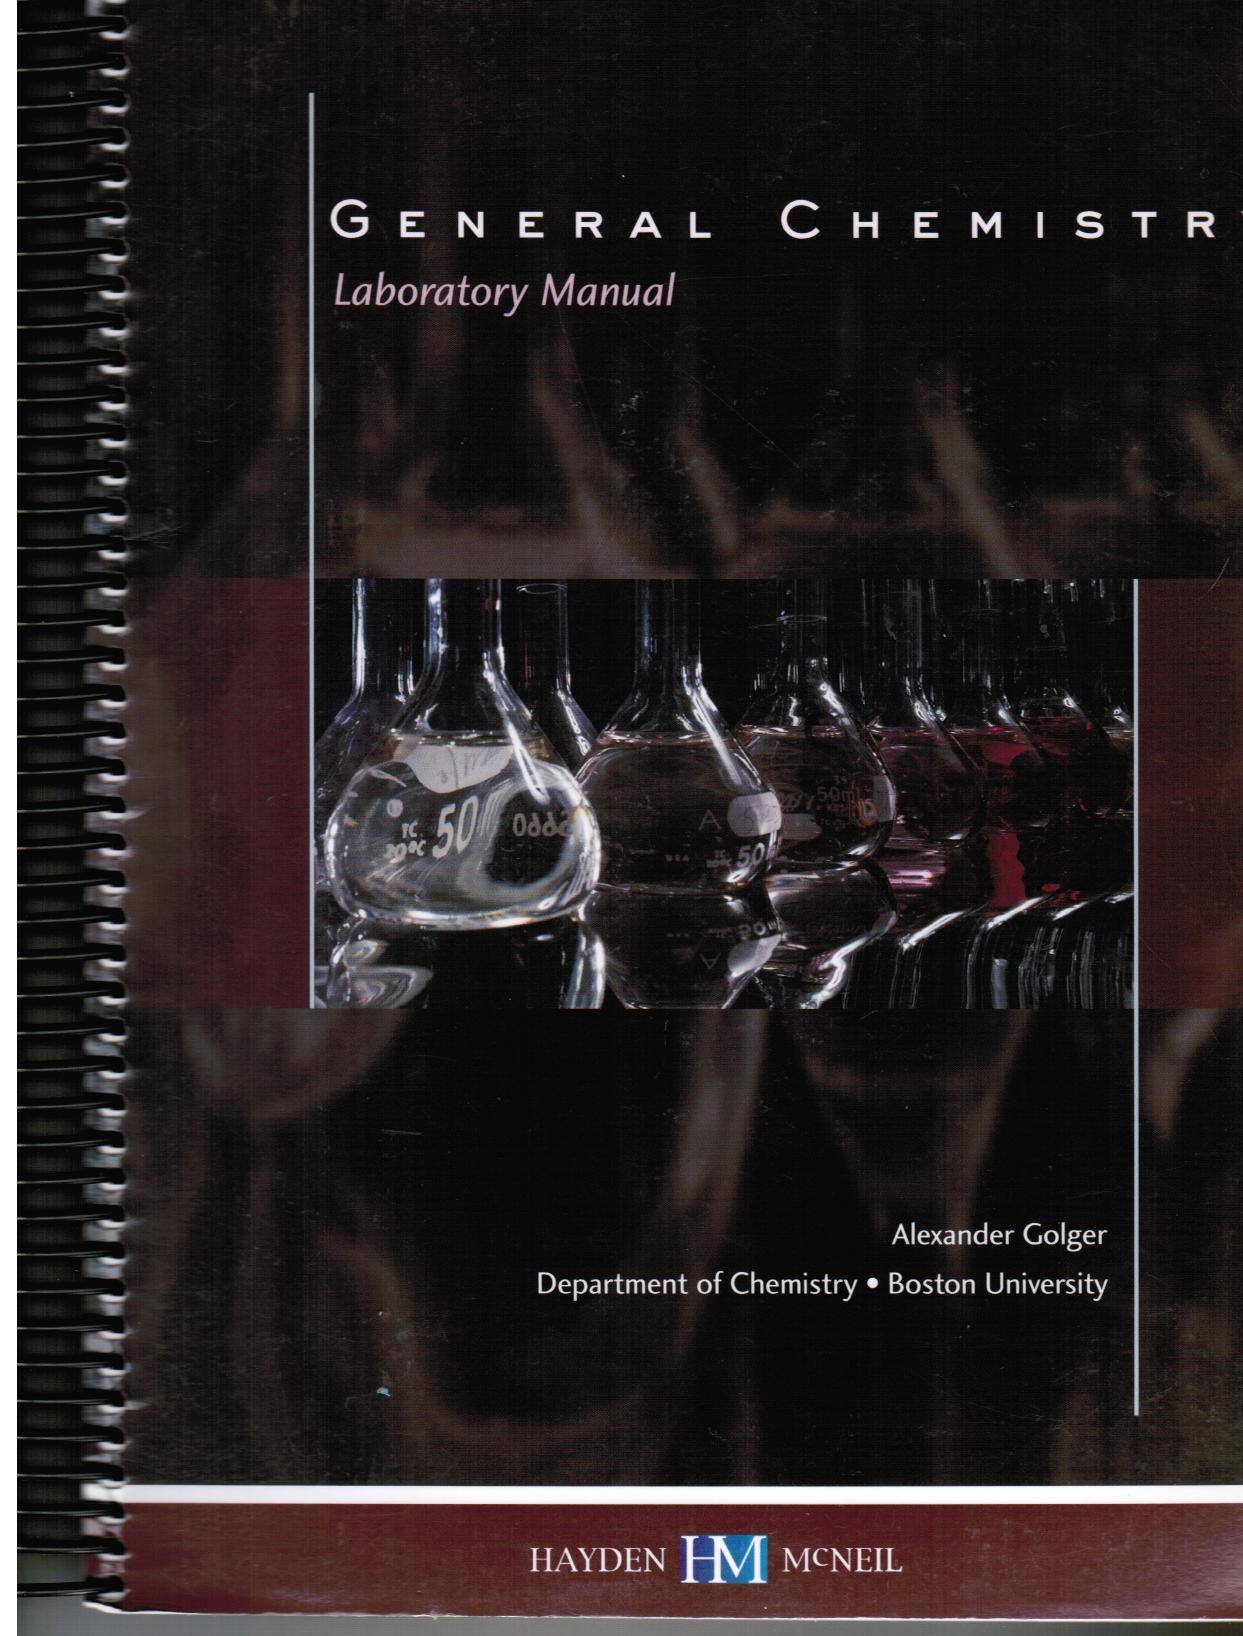 General Chemistry Laboratory Syllabus and Manual: Dept. of Chemistry,  Boston University Alexander Golger: 9780738030258: Amazon.com: Books